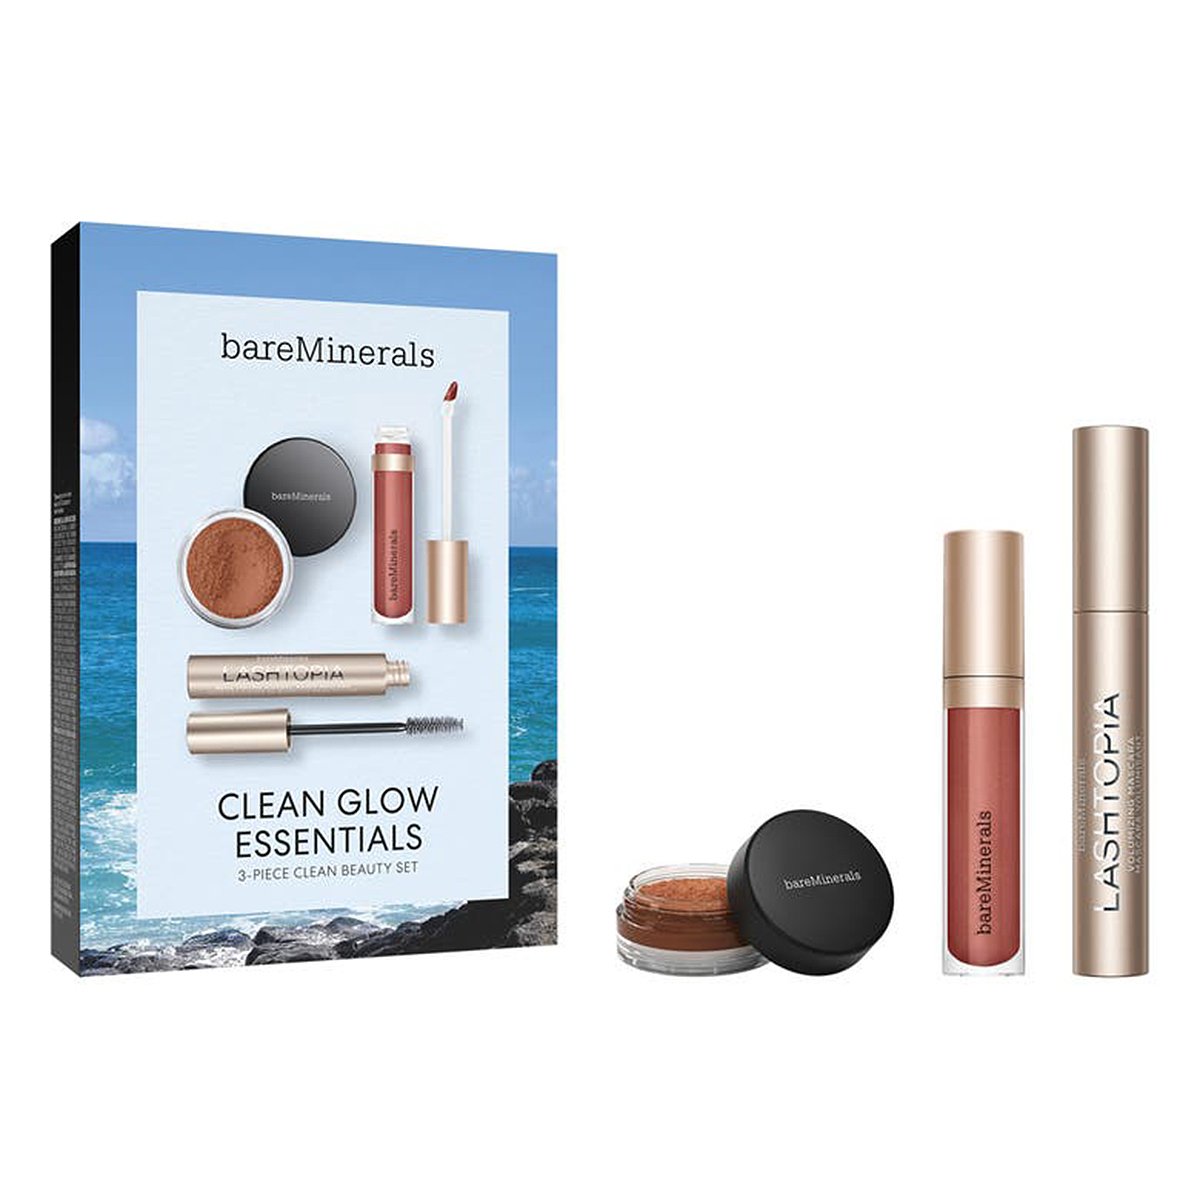 nordstrom-anniversary-sale-makeup